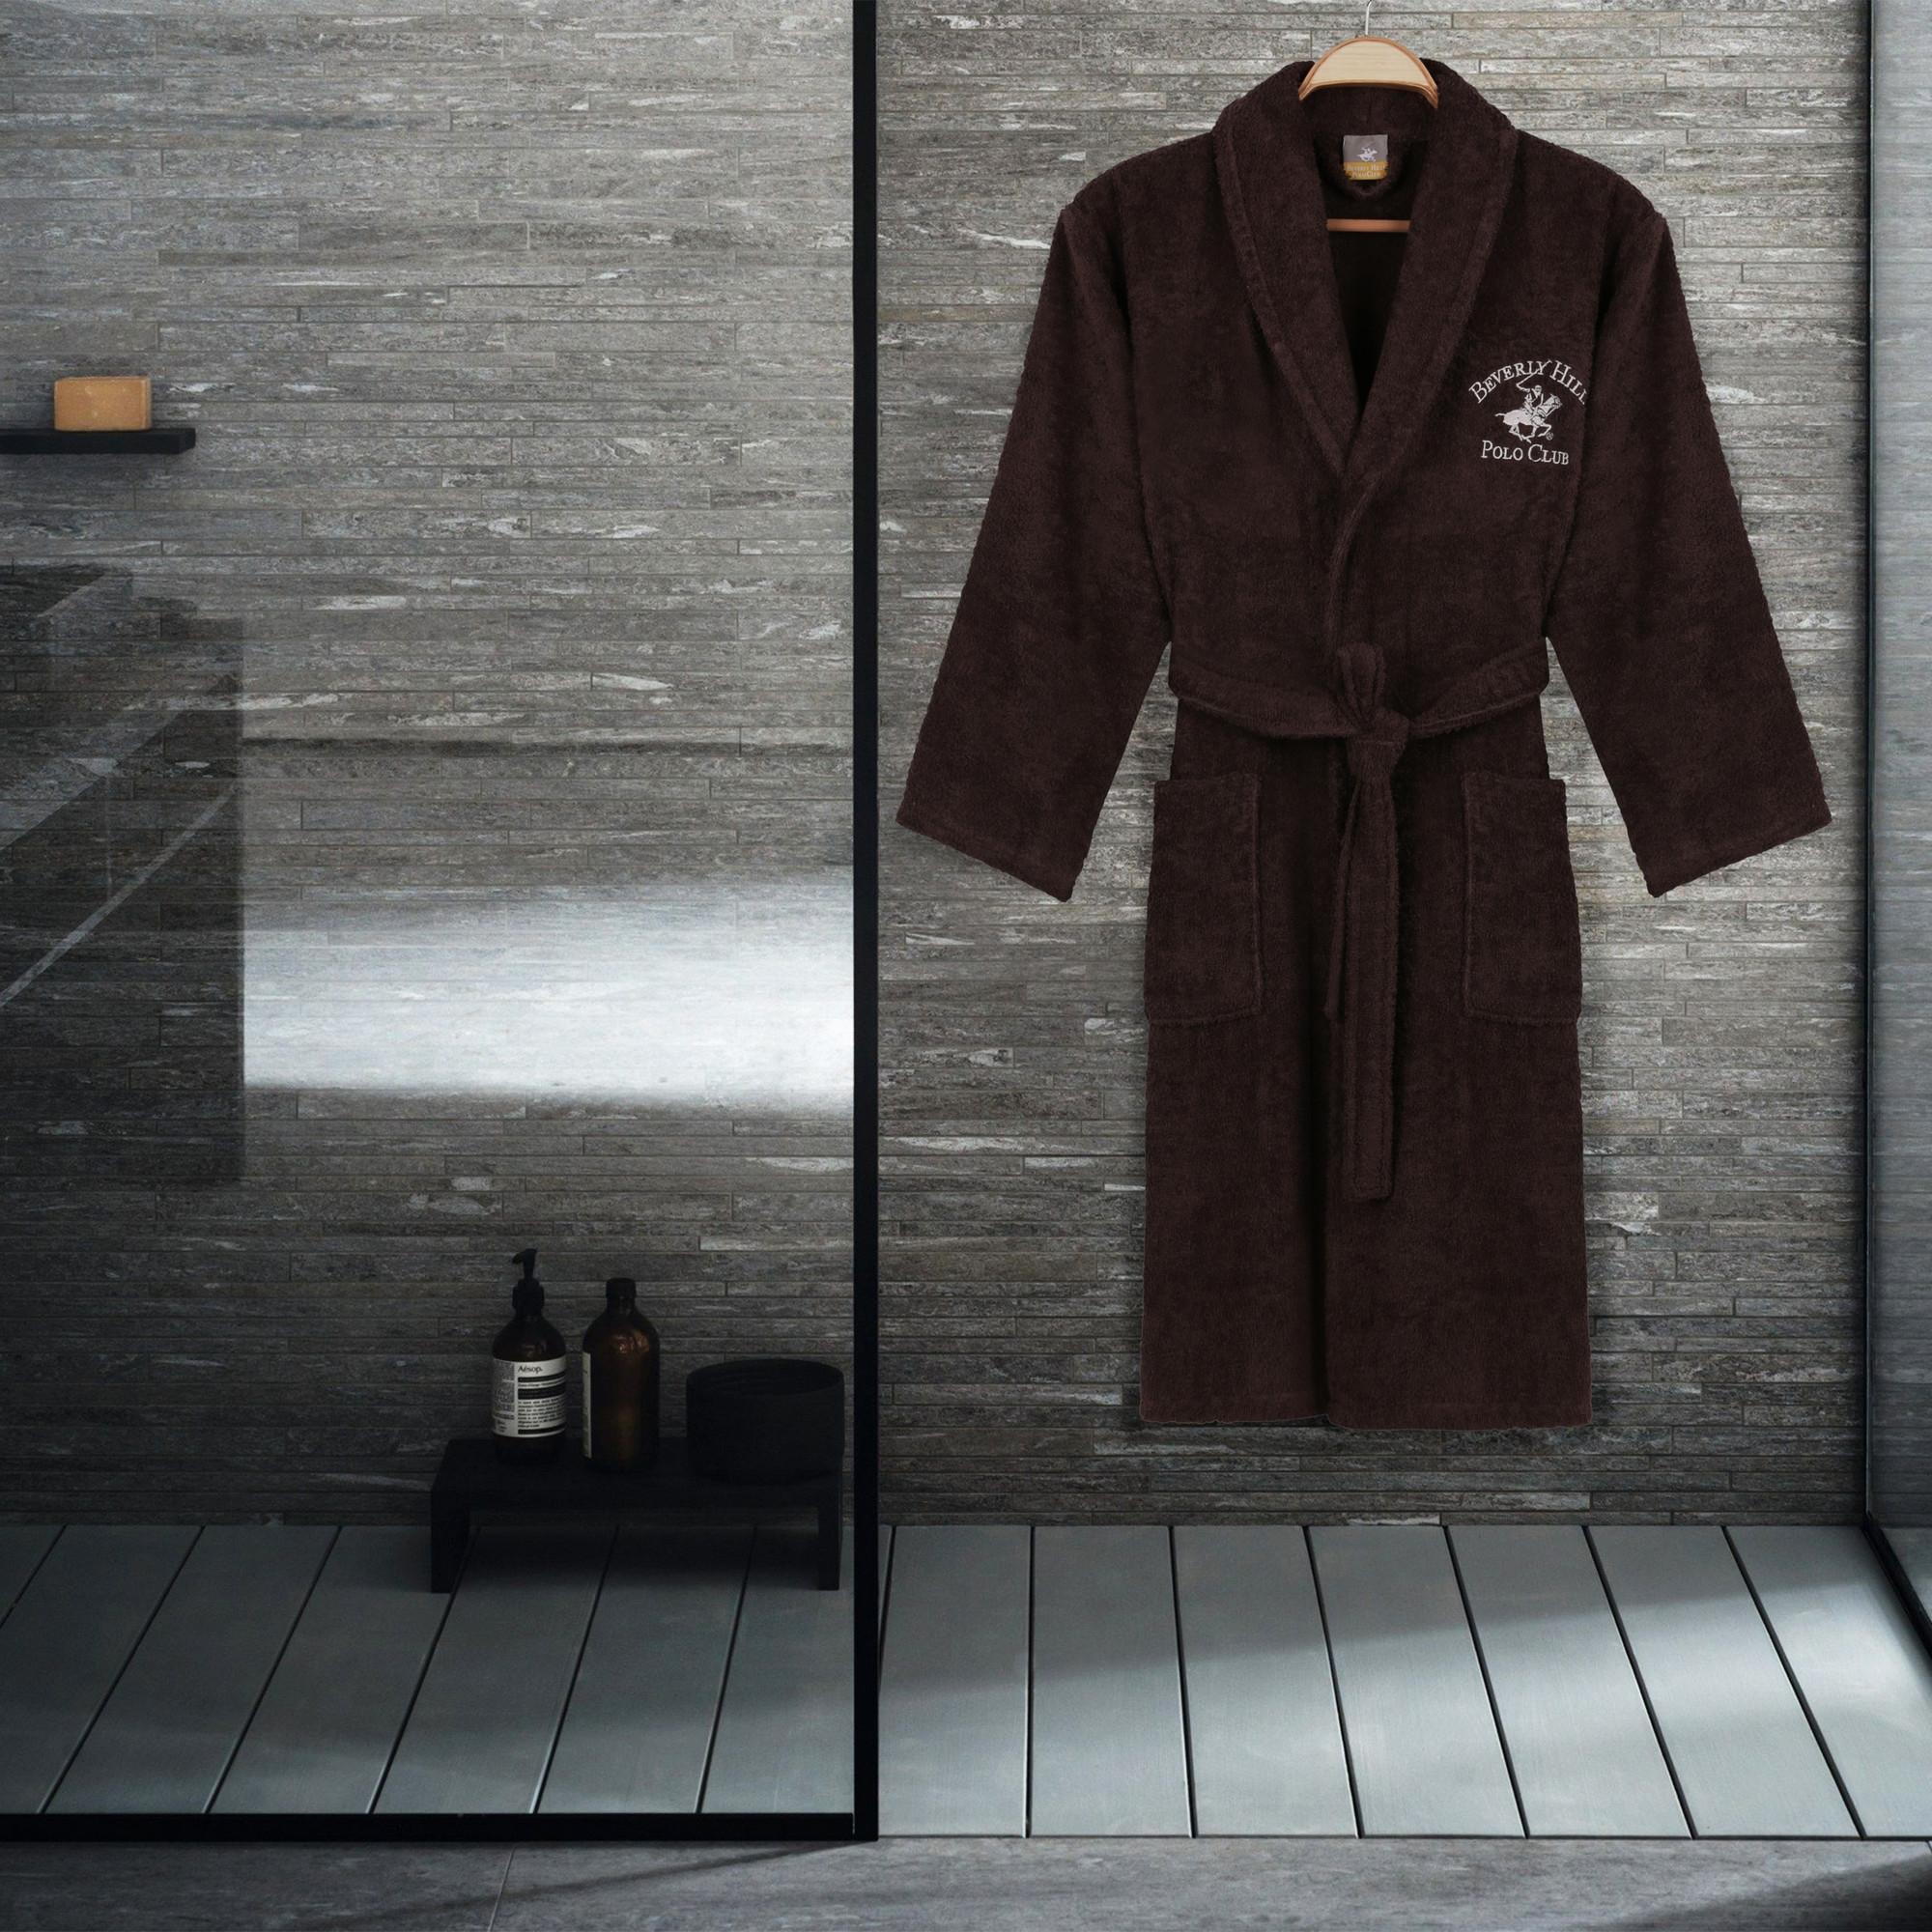 Halat de baie unisex, din bumbac, Beverly Hills Polo Club 700 Maro, L / XL